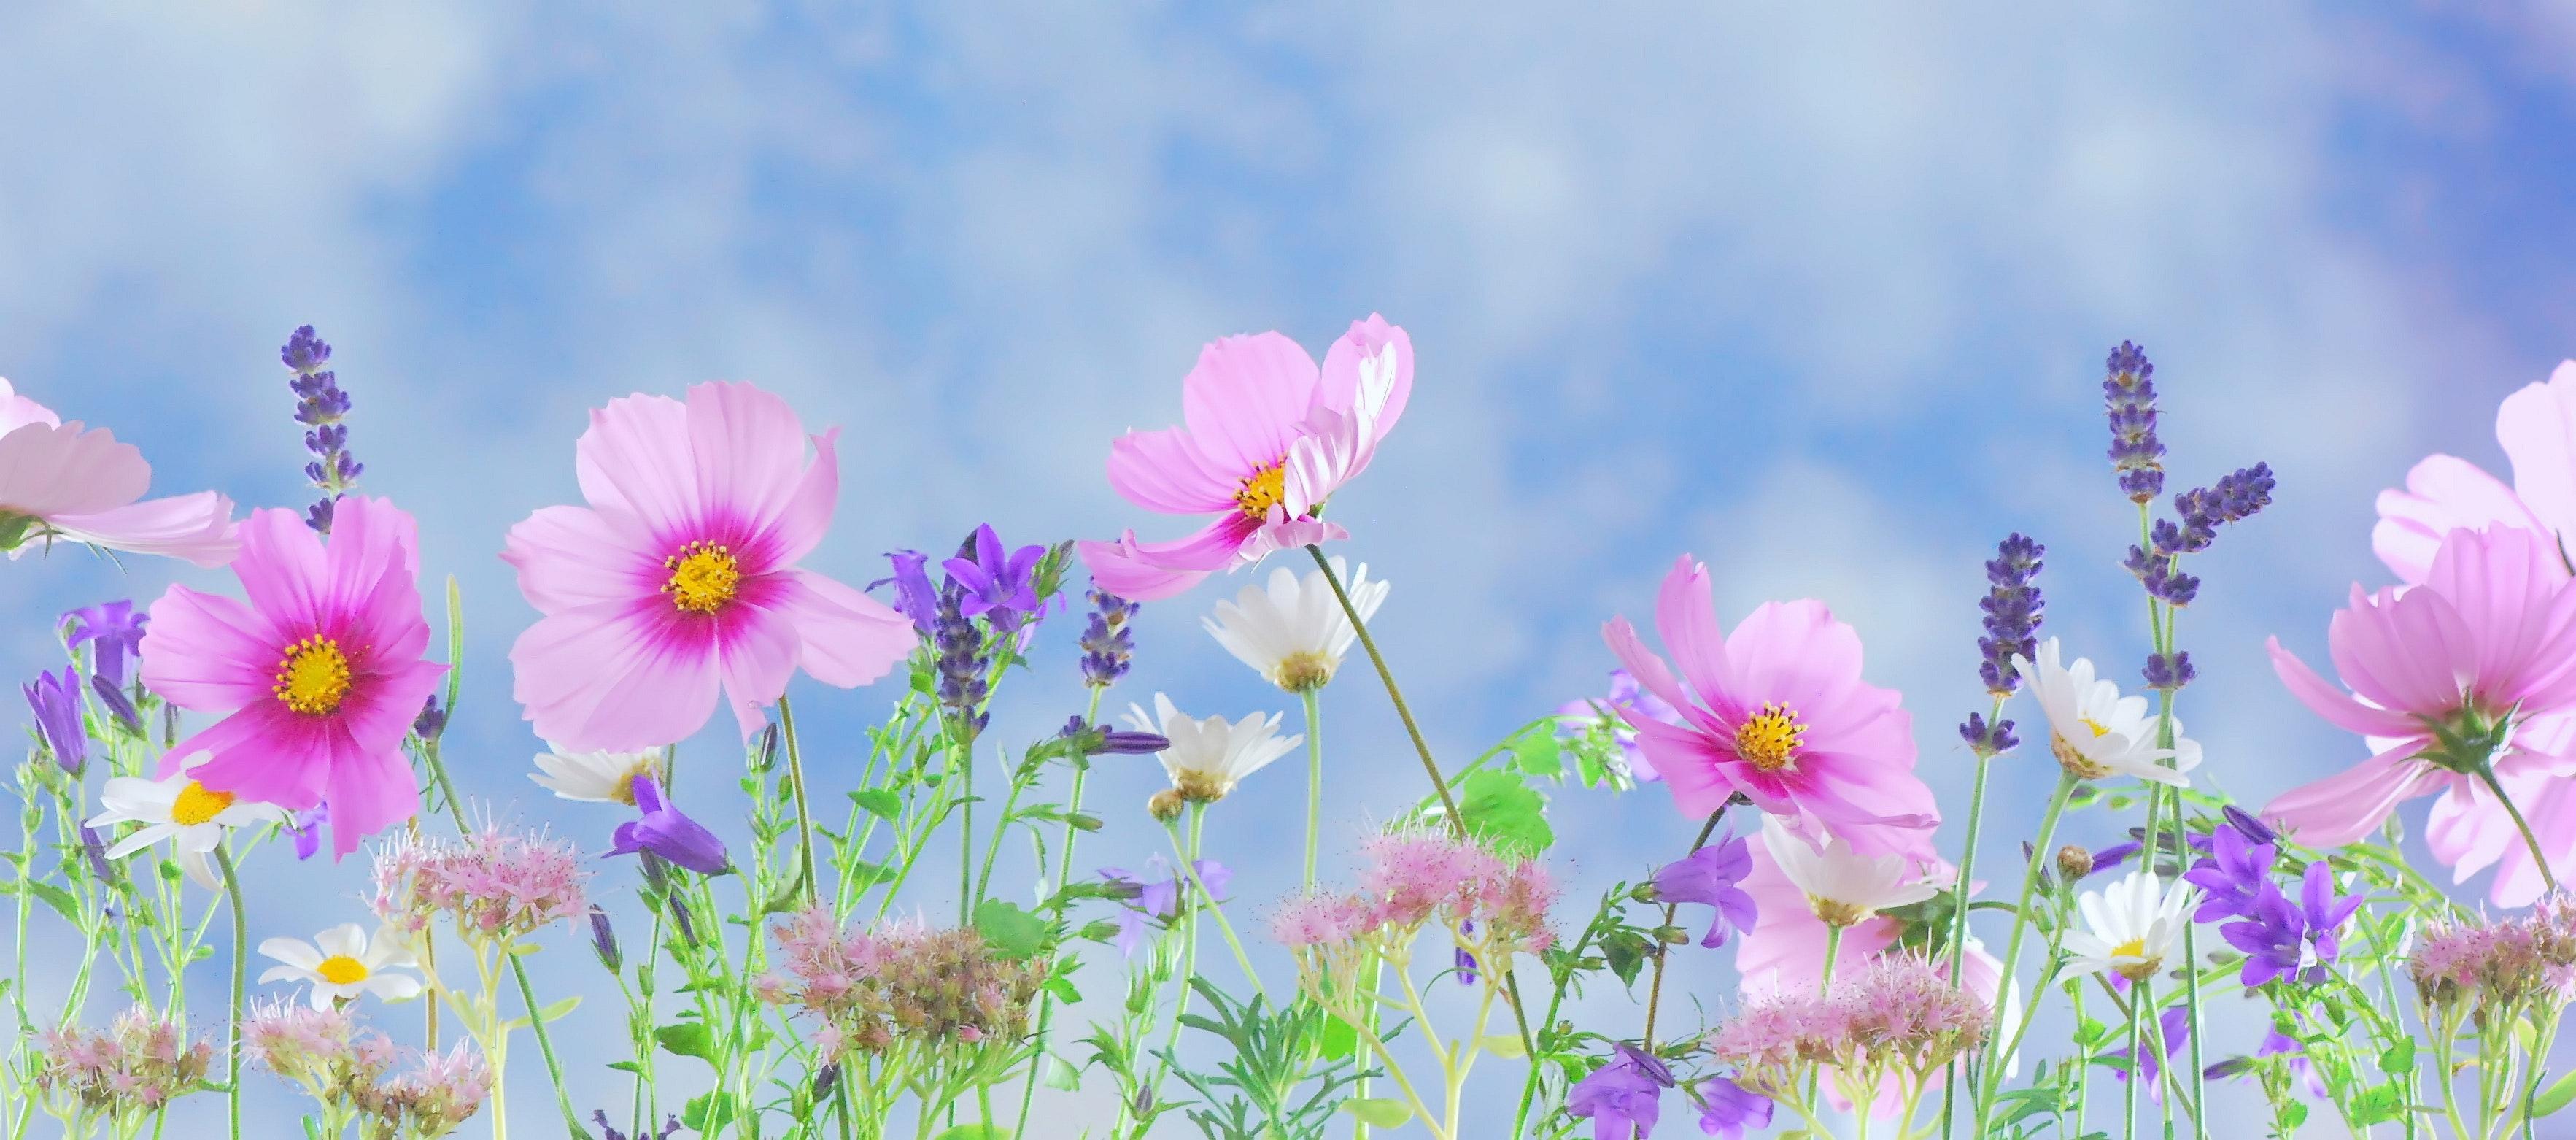 Pink Petaled Flower During Daytime Free Stock Photo